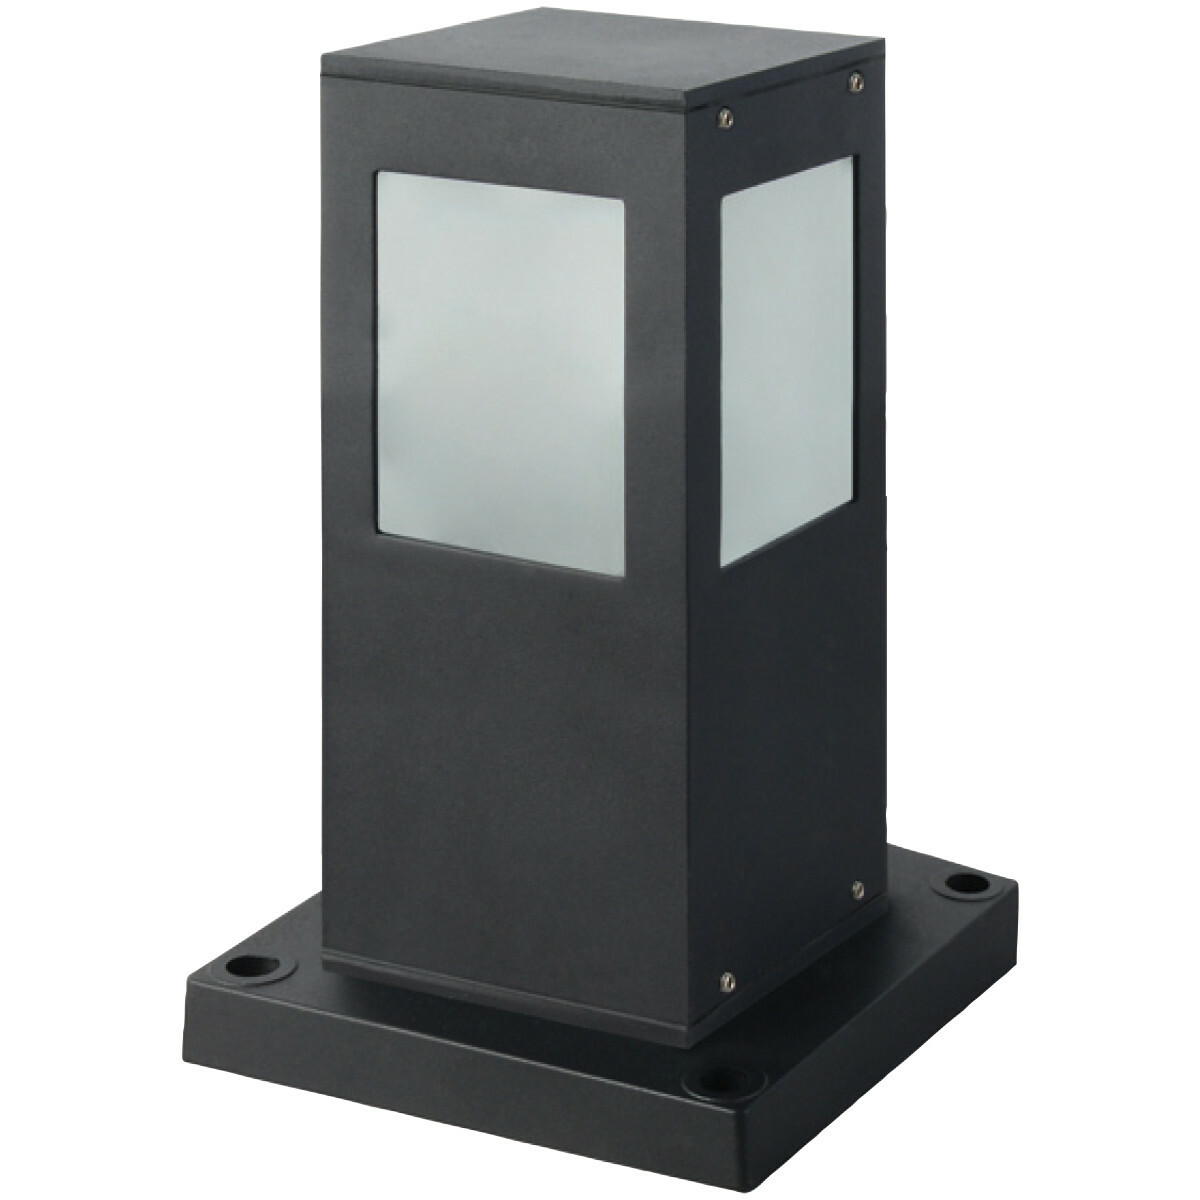 PHILIPS - LED Tuinverlichting - Staande Buitenlamp - CorePro LEDbulb 827 A60 - Kavy 3 - E27 Fitting